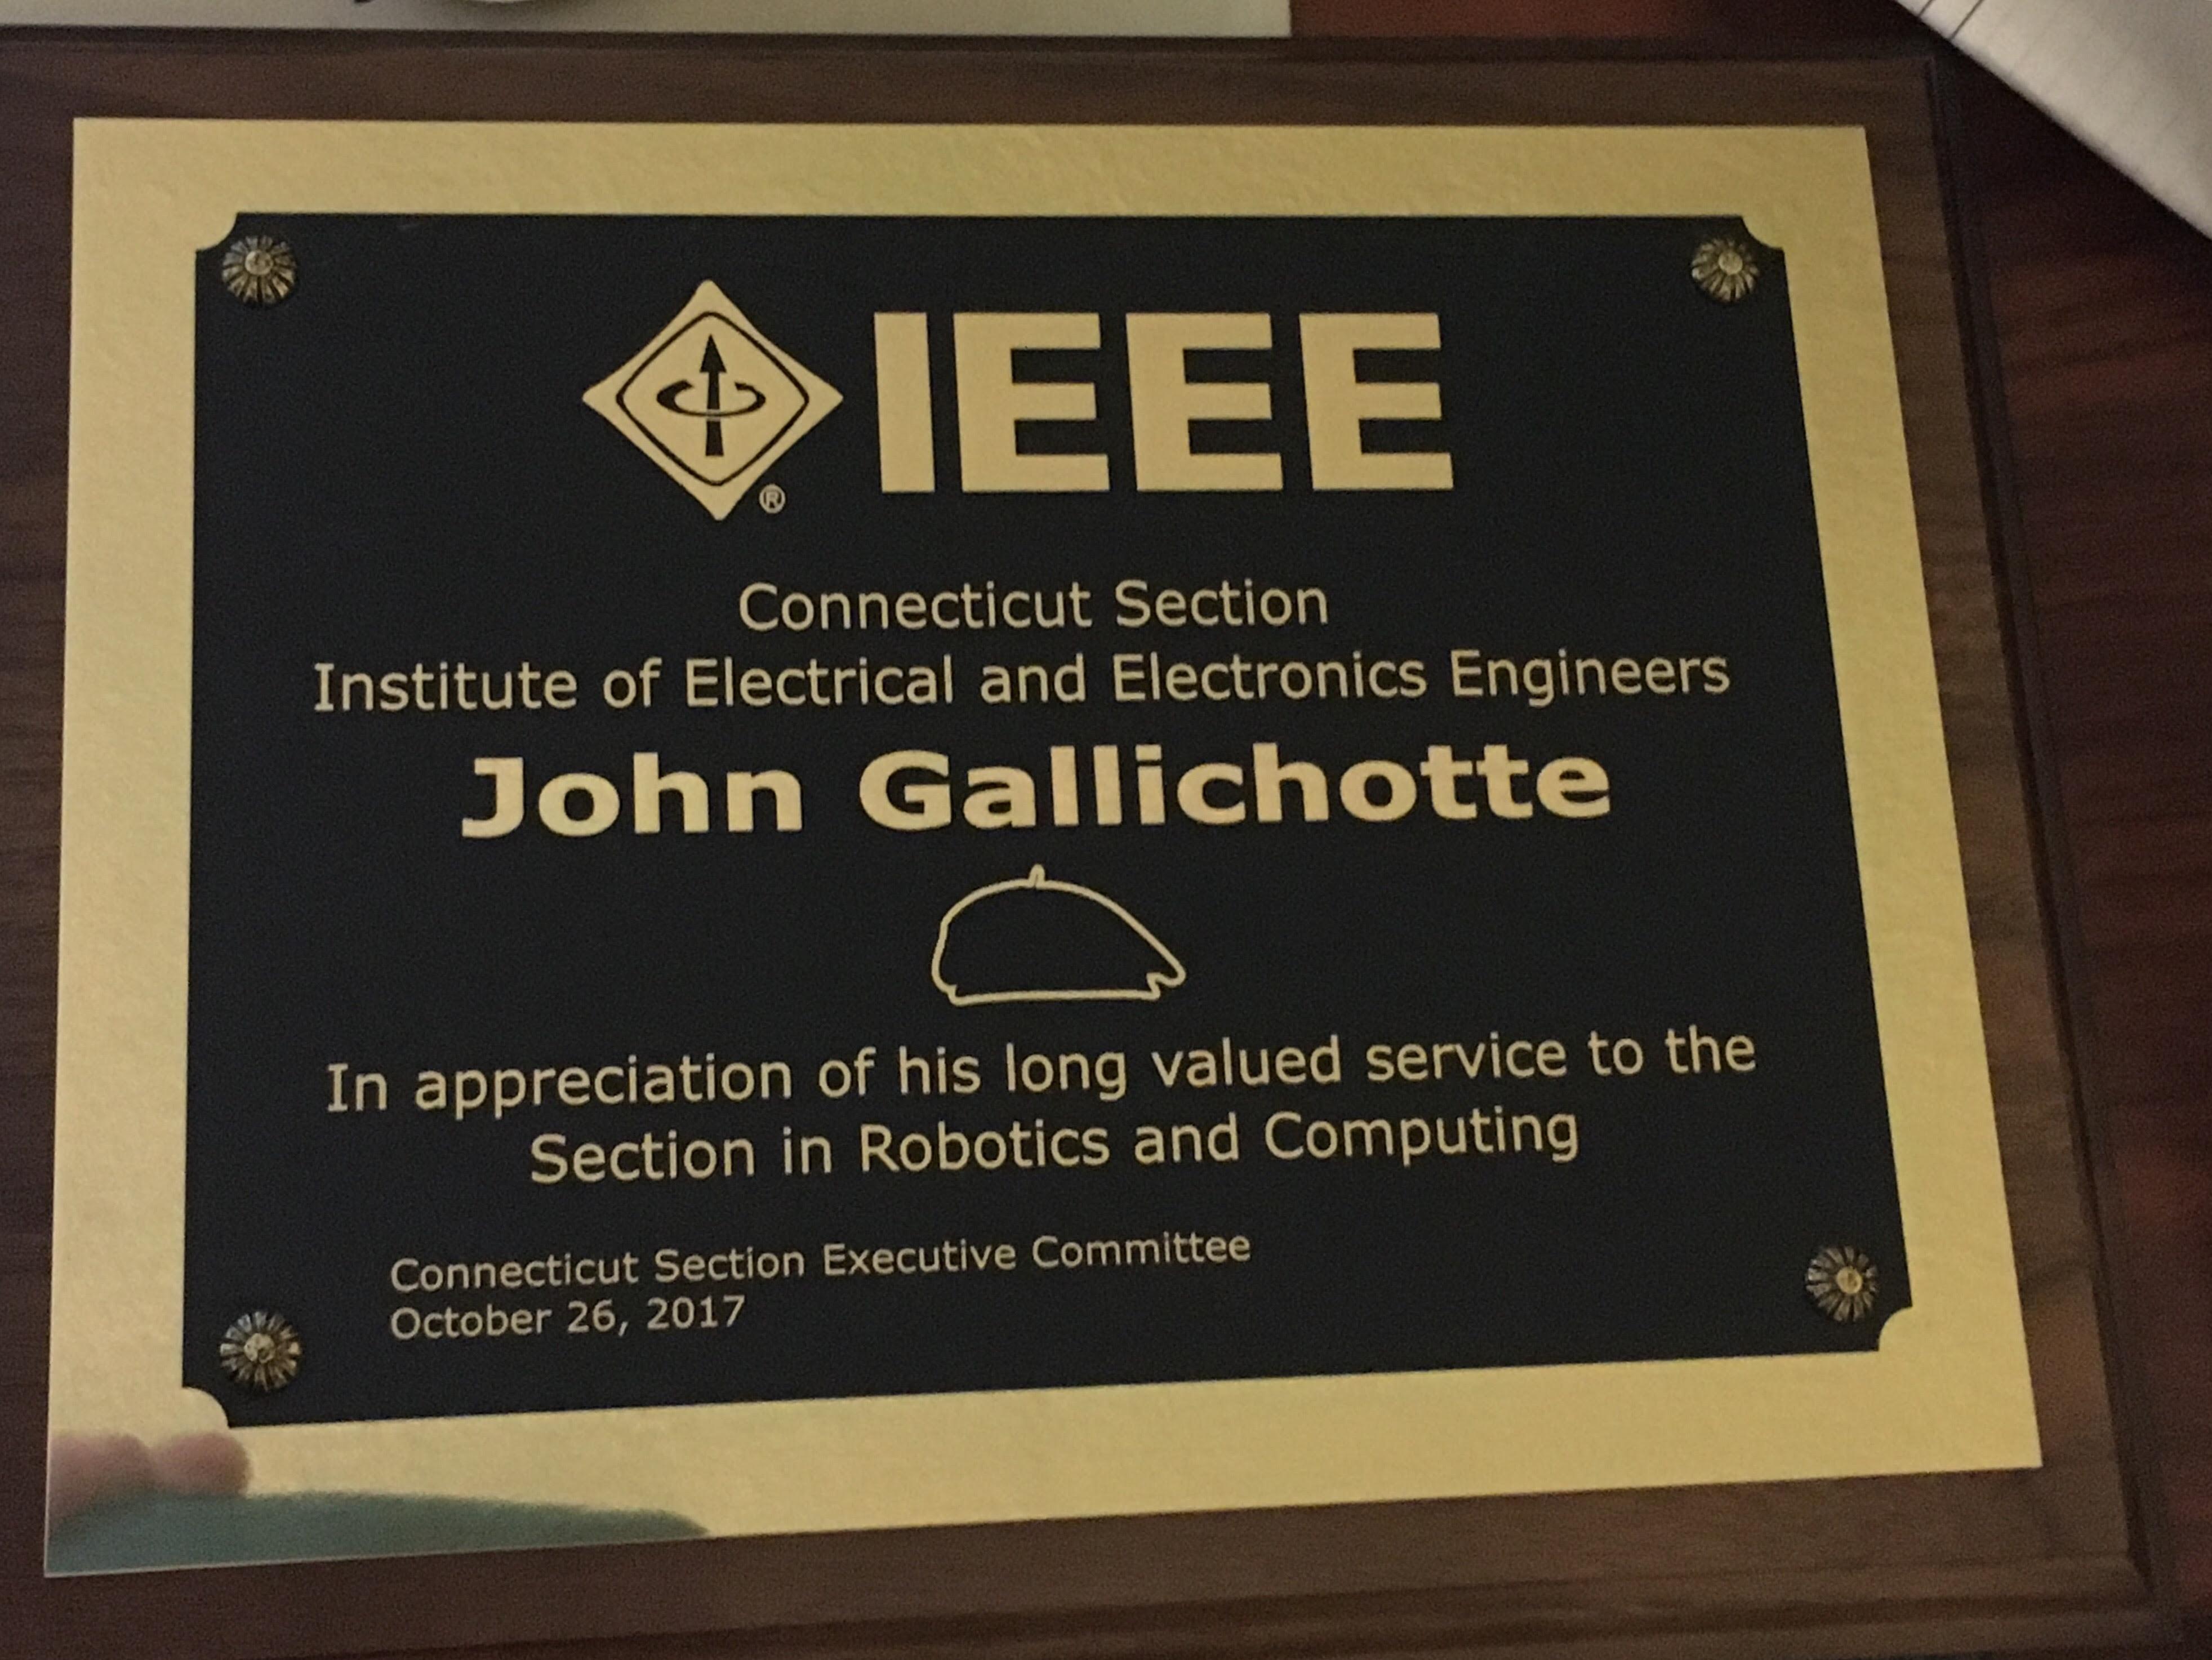 John Gallichotte